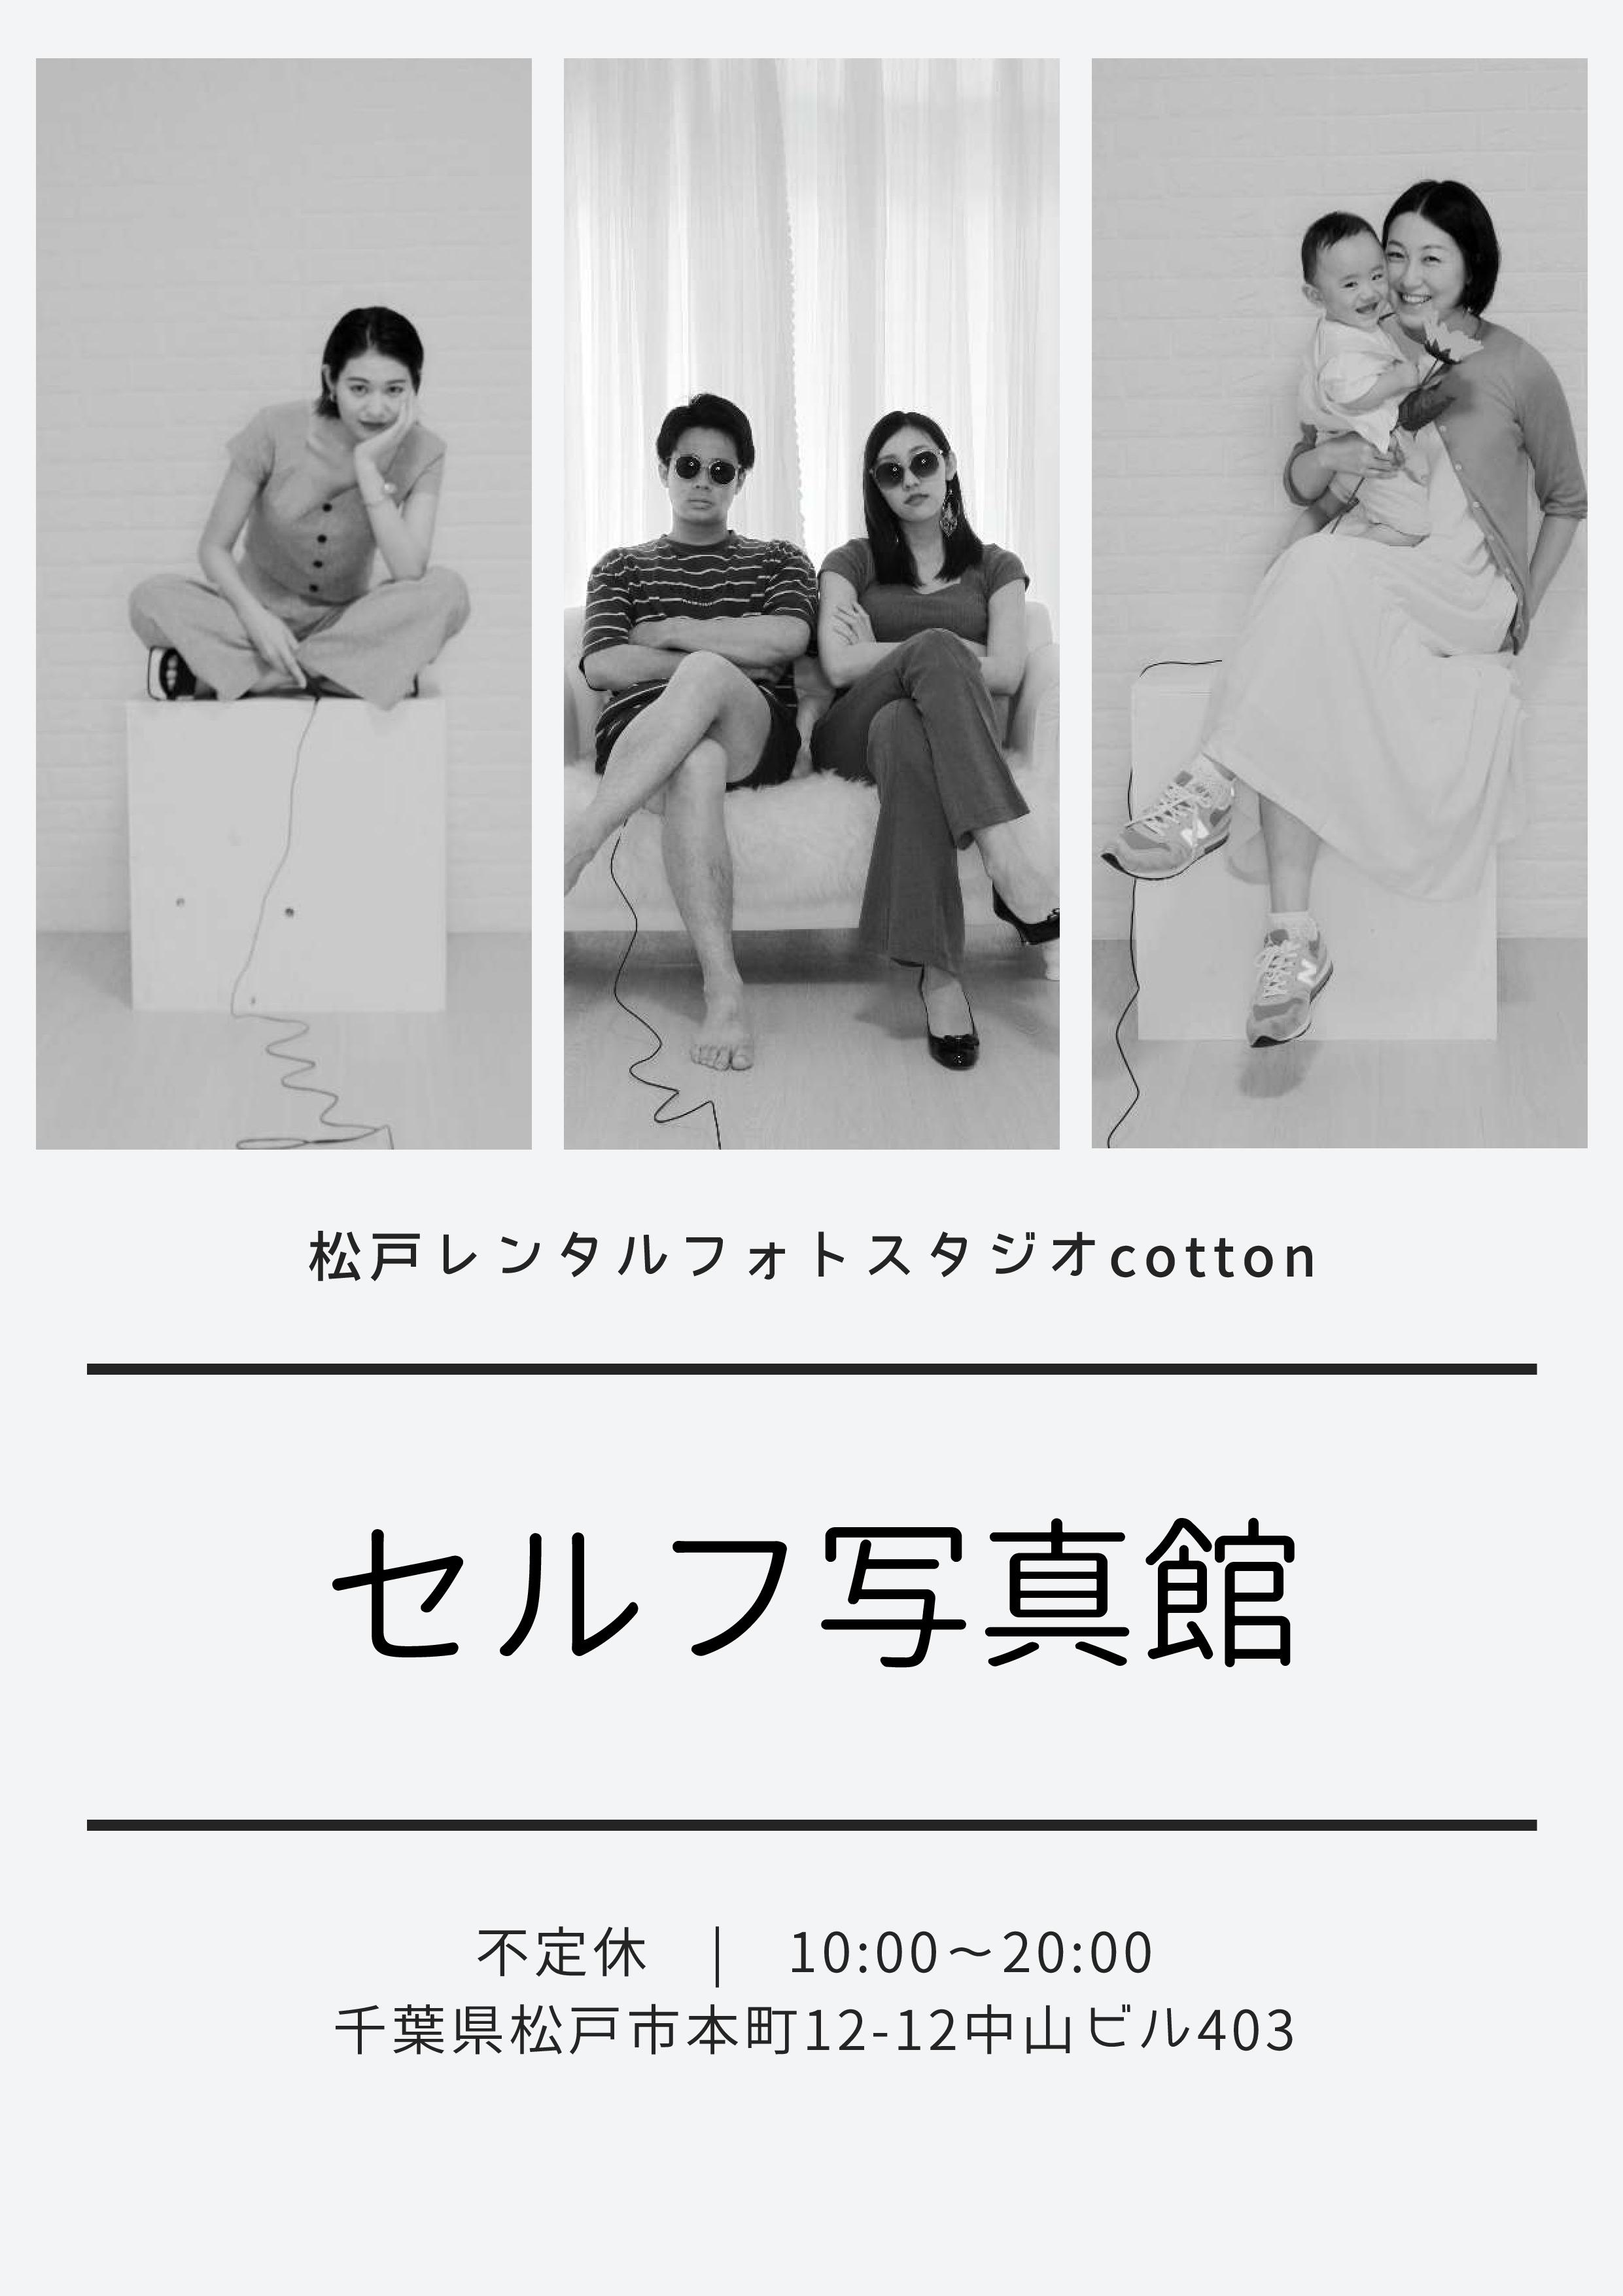 セルフ写真館松戸千葉県